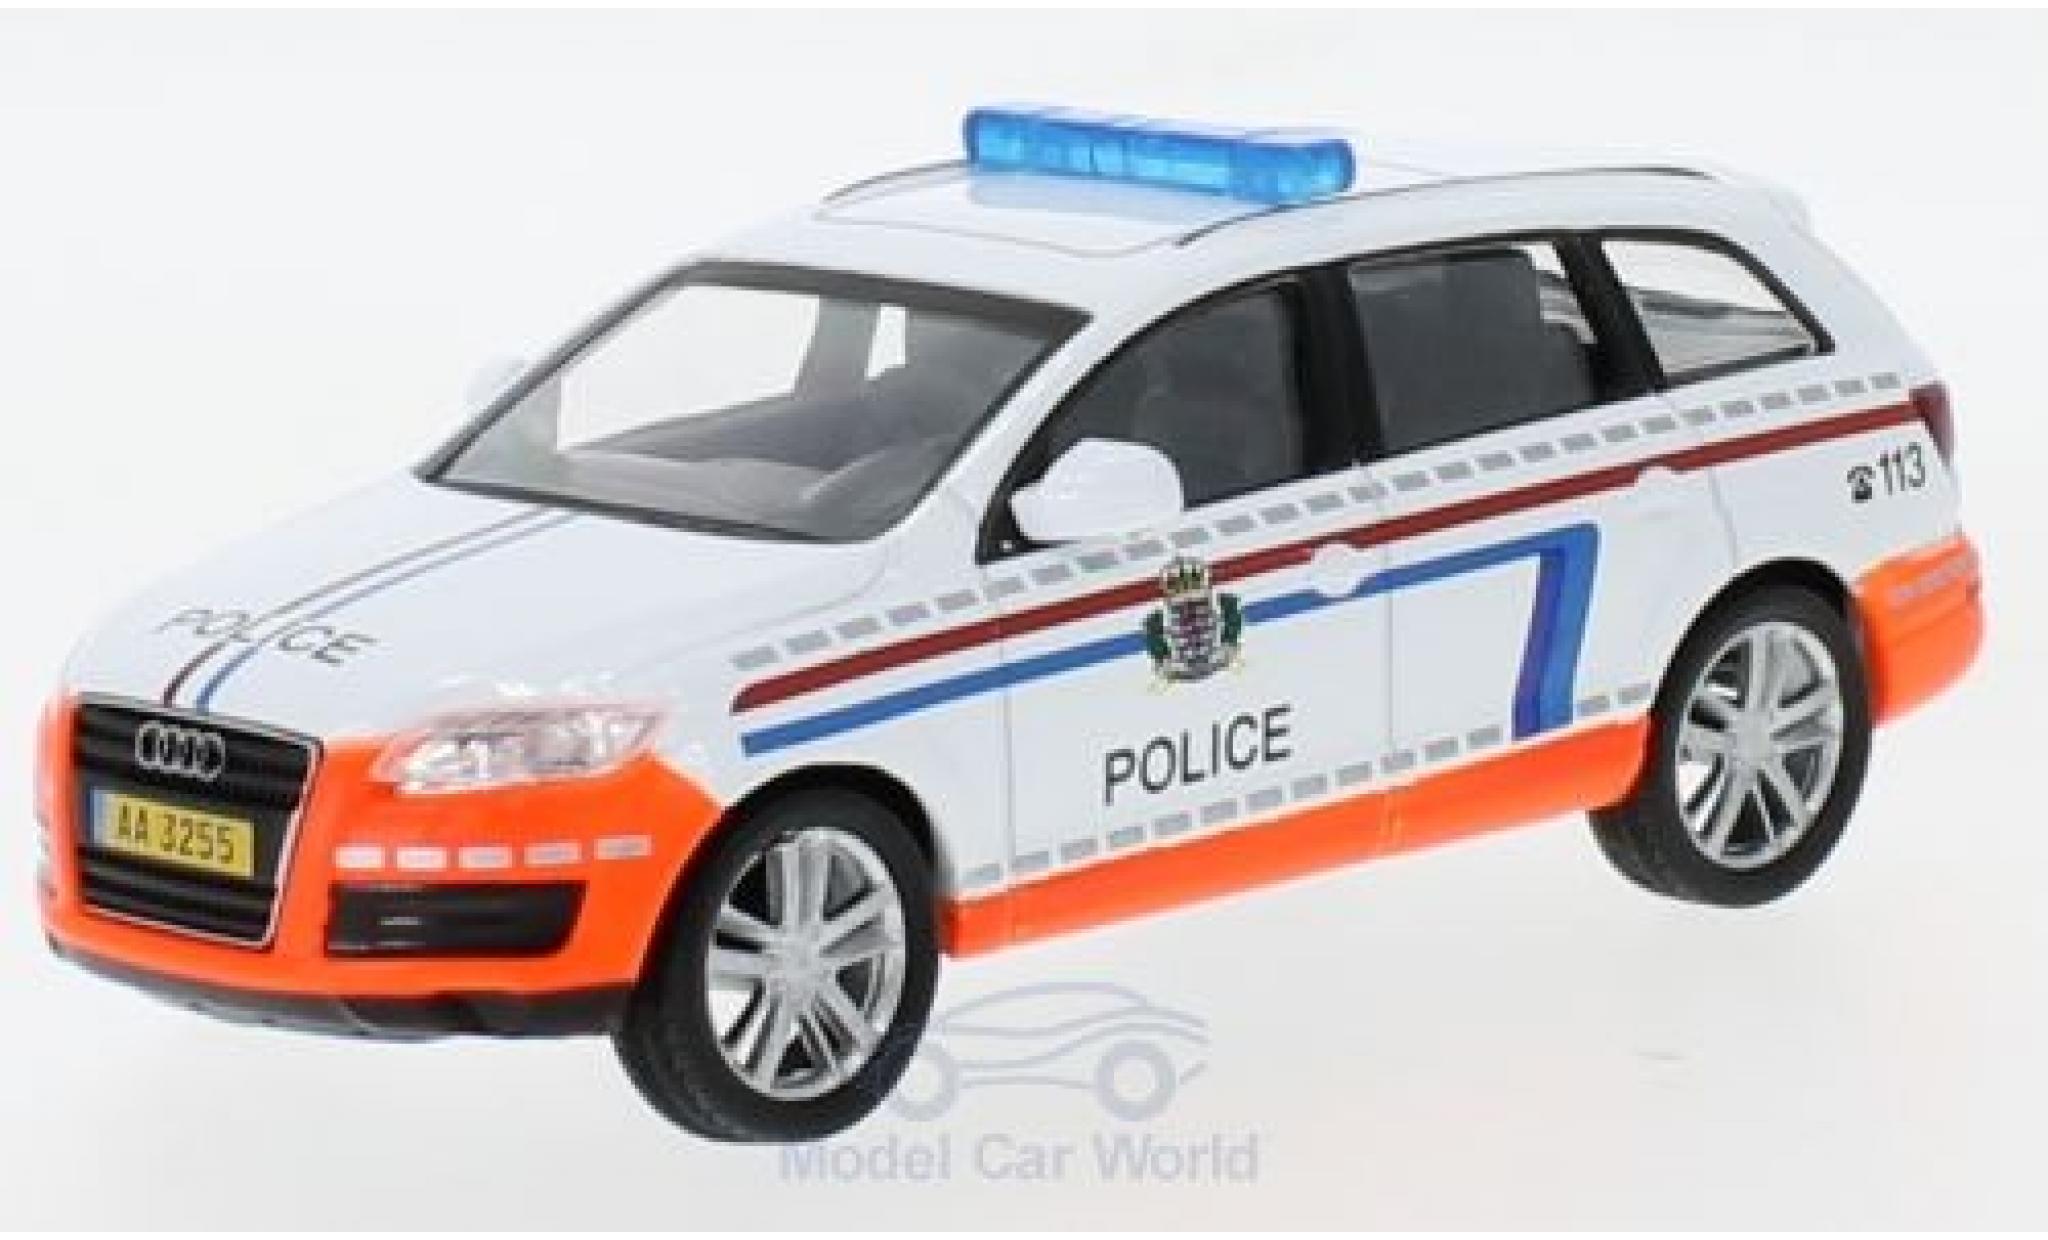 Audi Q7 1/43 SpecialC 80 Police ohne Vitrine